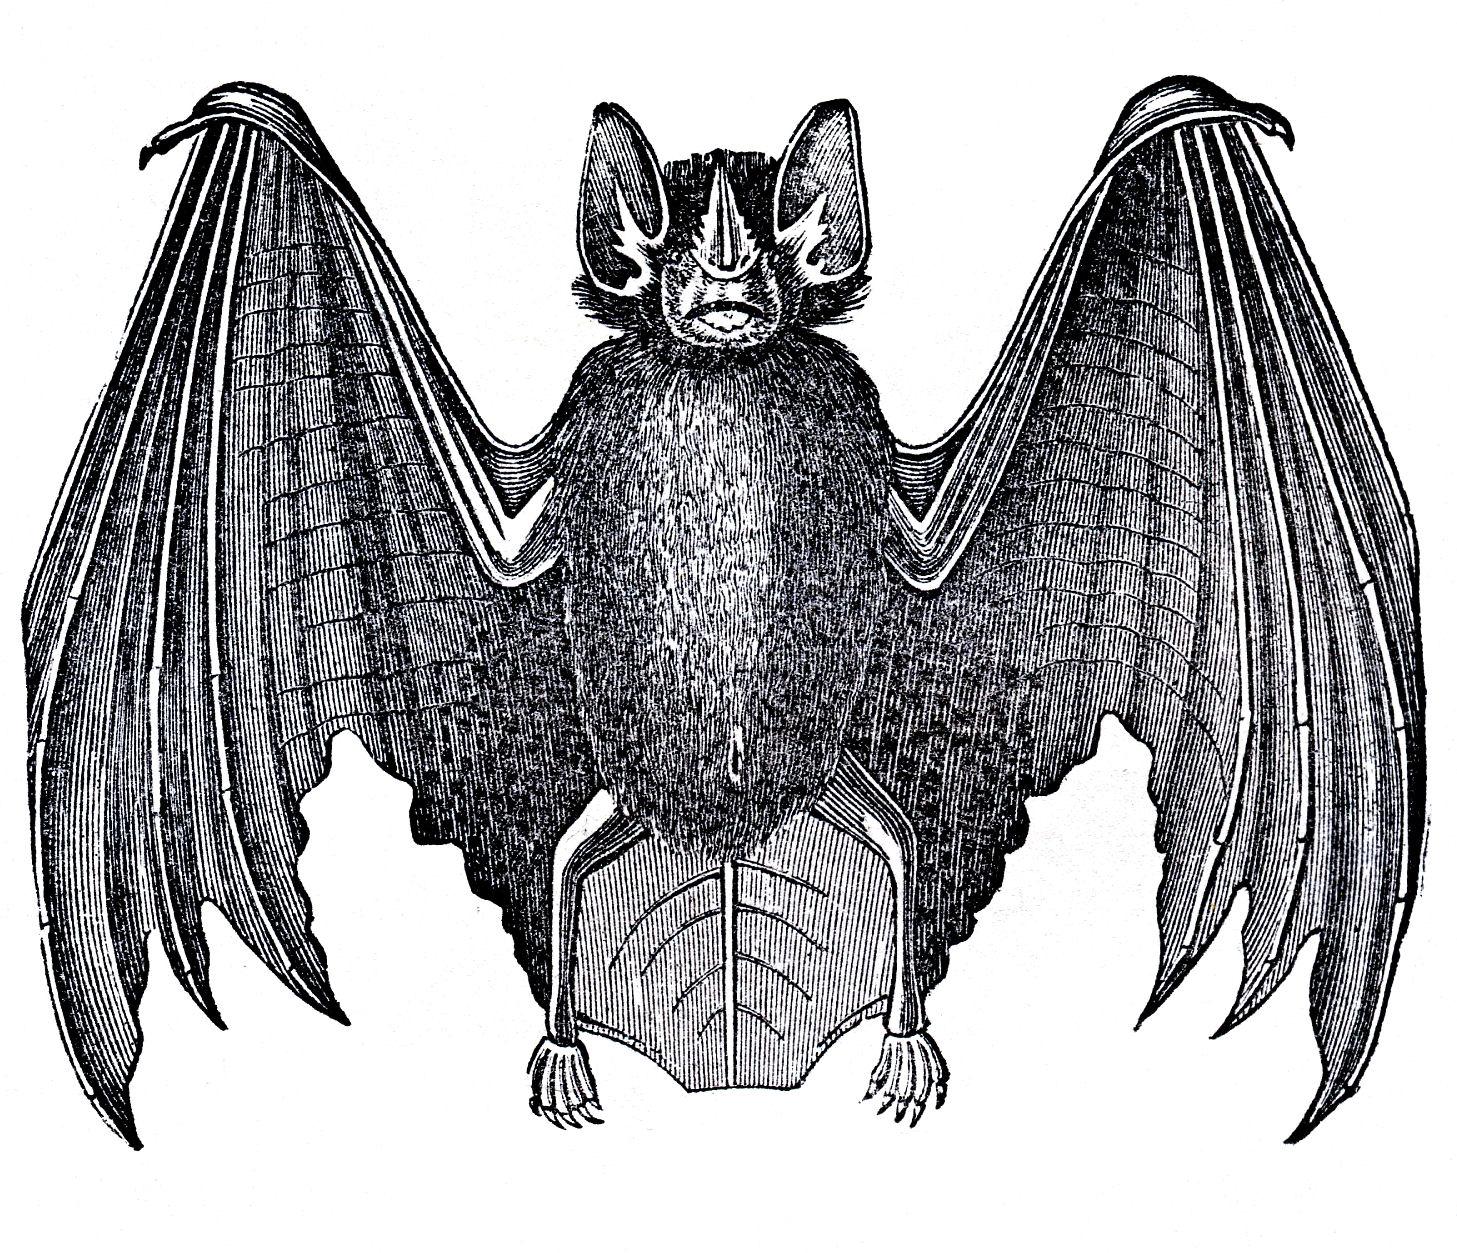 Antique bat free clipart picture transparent library 12 Bat Images - Vintage Halloween! - The Graphics Fairy picture transparent library